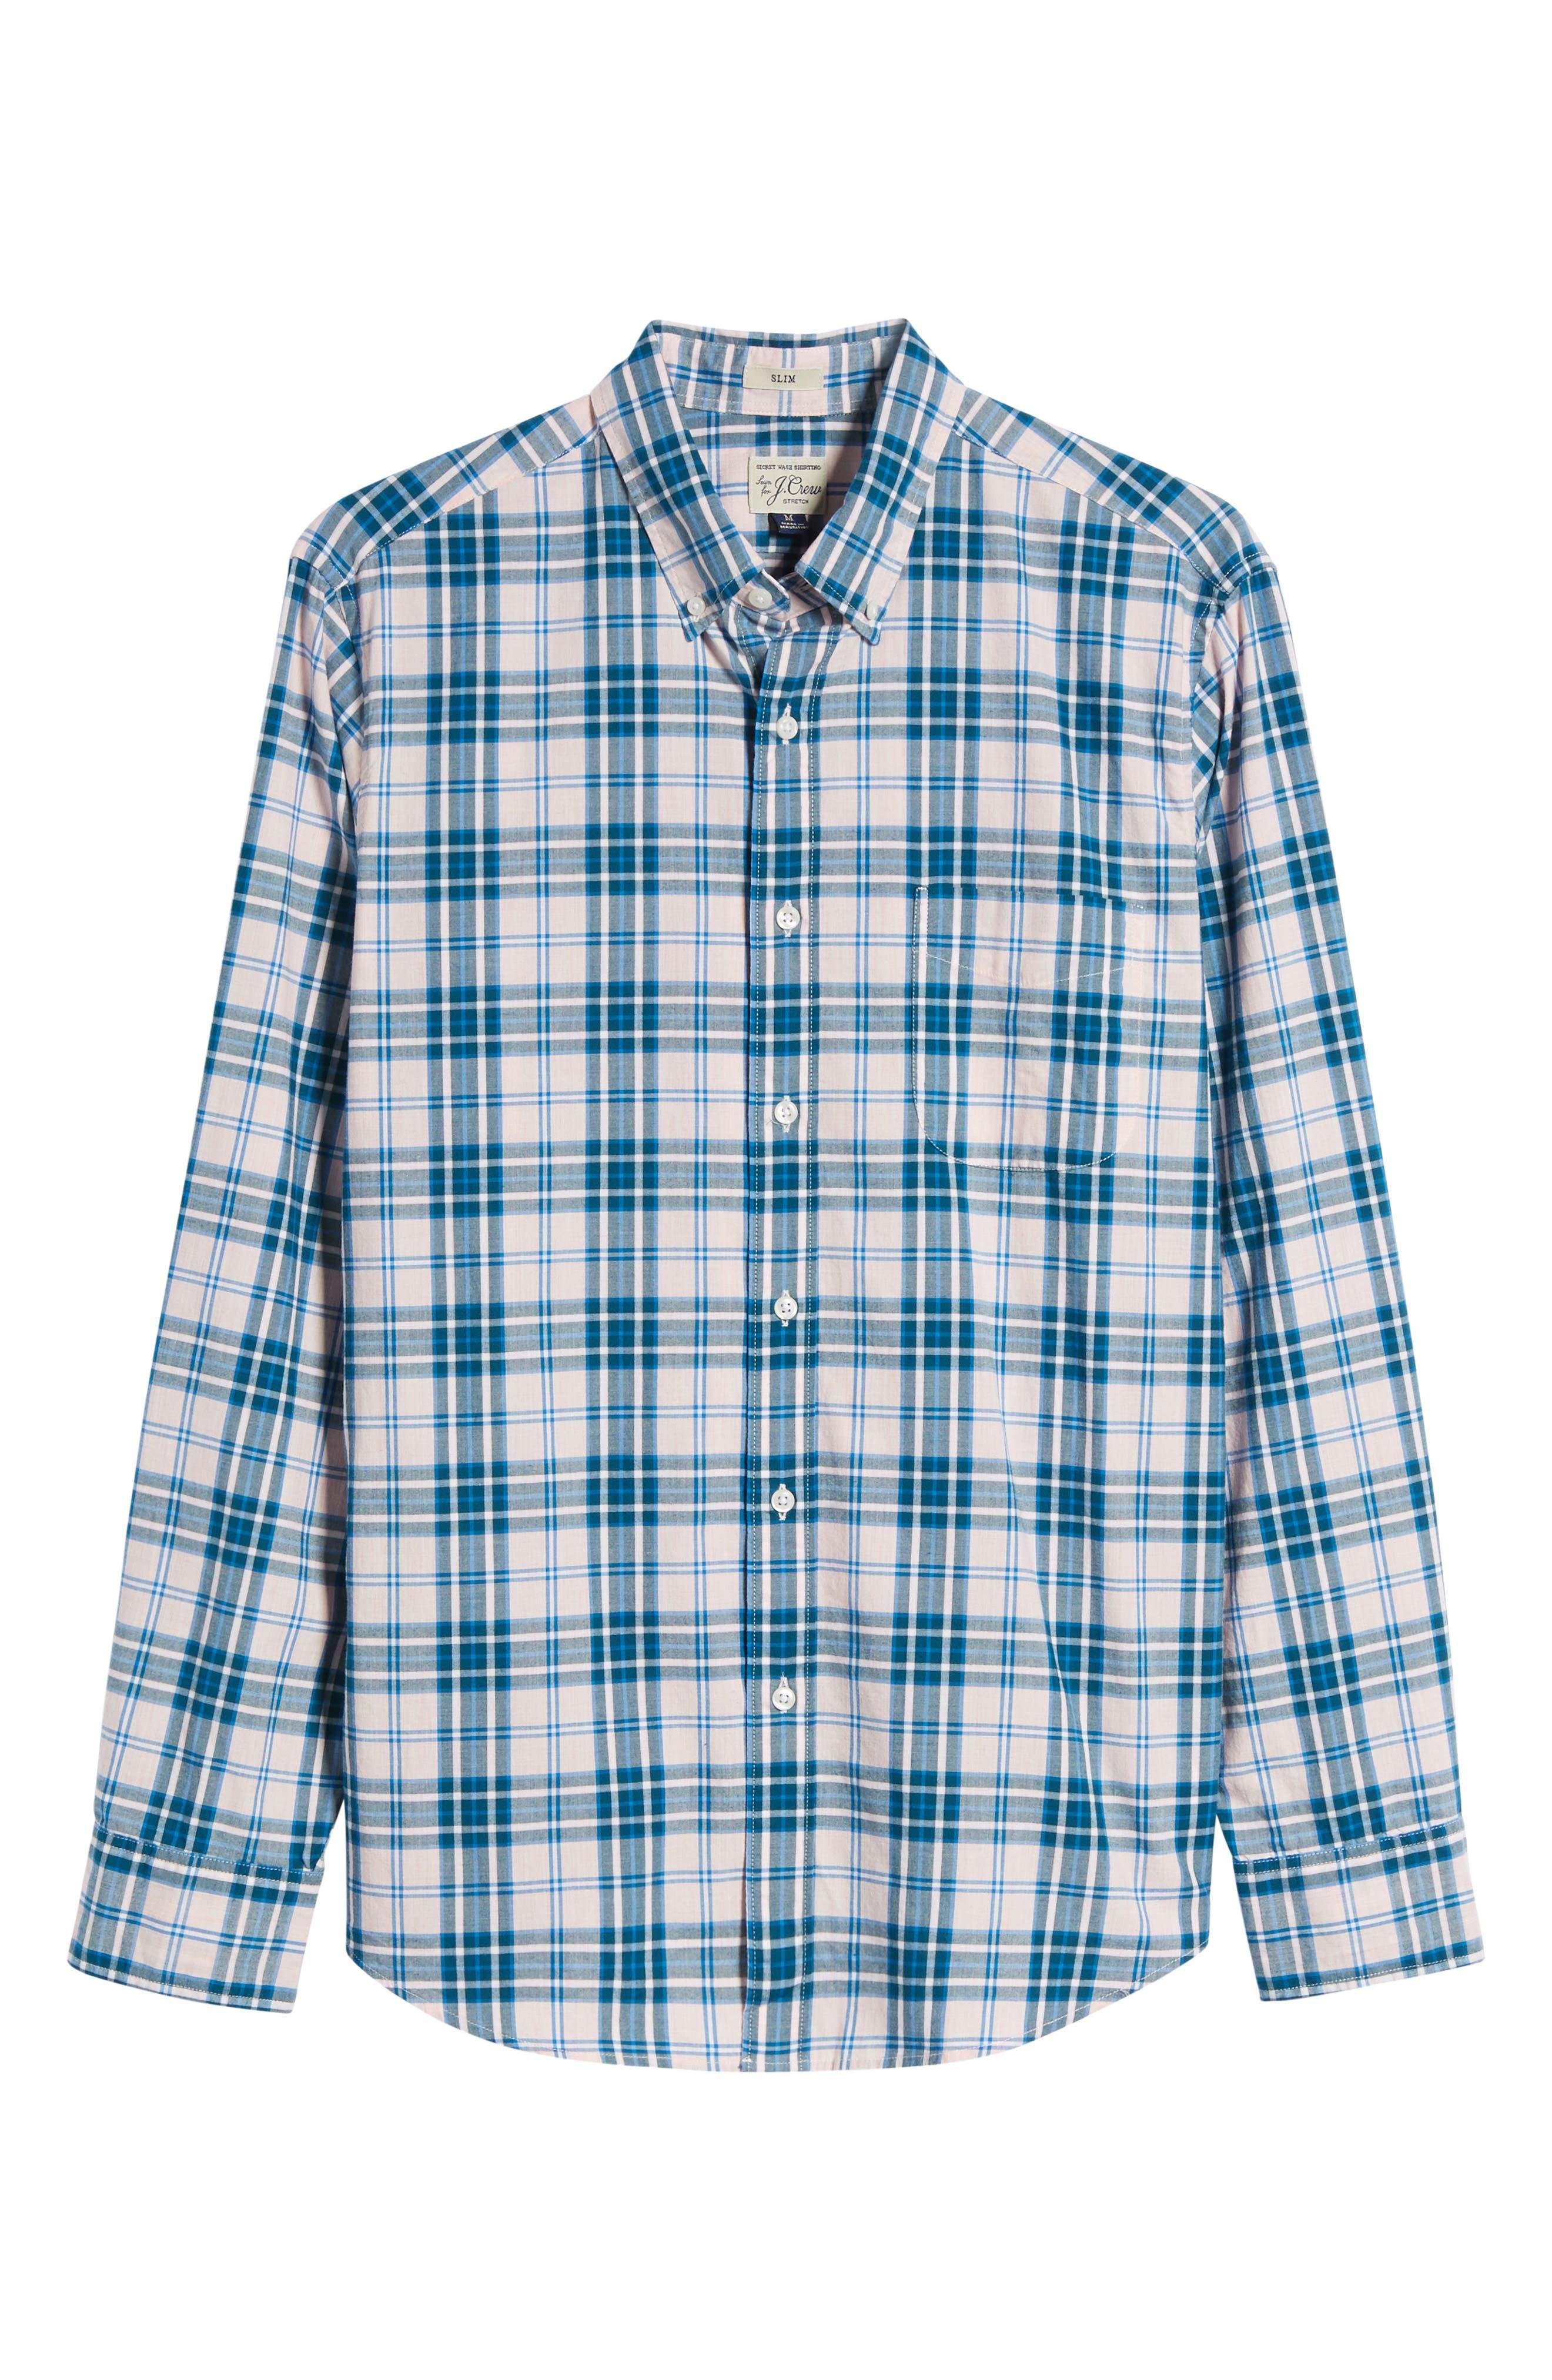 Slim Fit Stretch Secret Wash Heather Poplin Plaid Sport Shirt,                             Alternate thumbnail 6, color,                             650